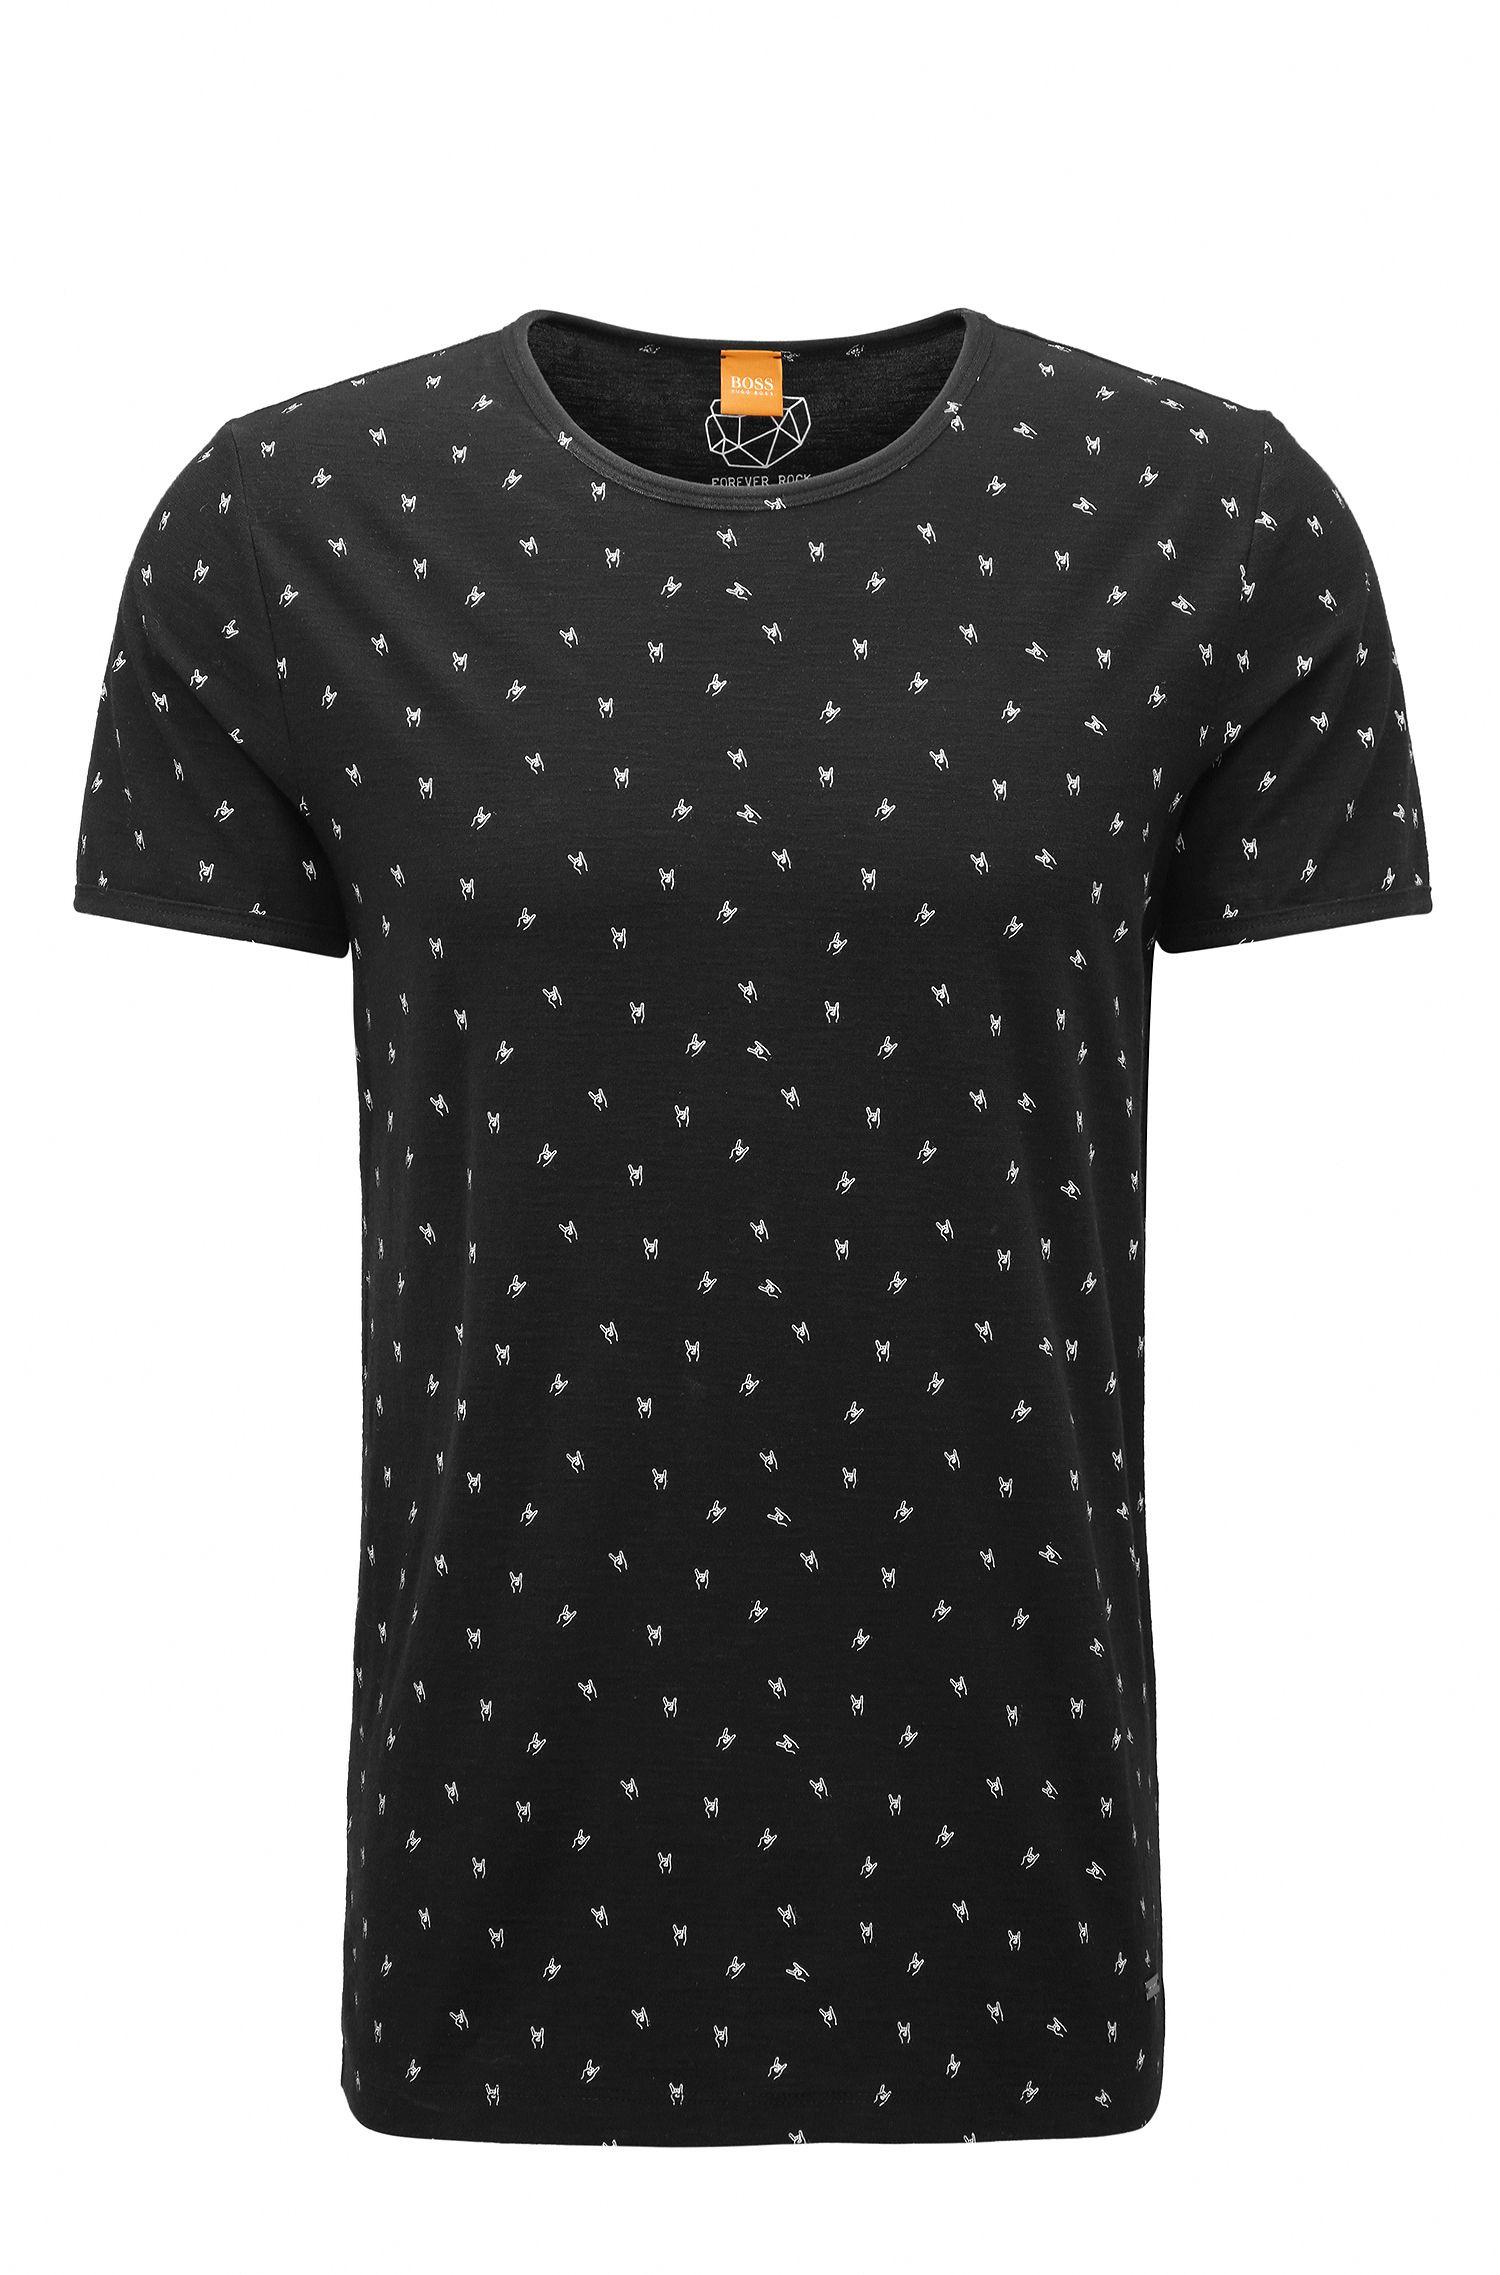 Printed Slub Jersey T-Shirt   Thoughts, Black